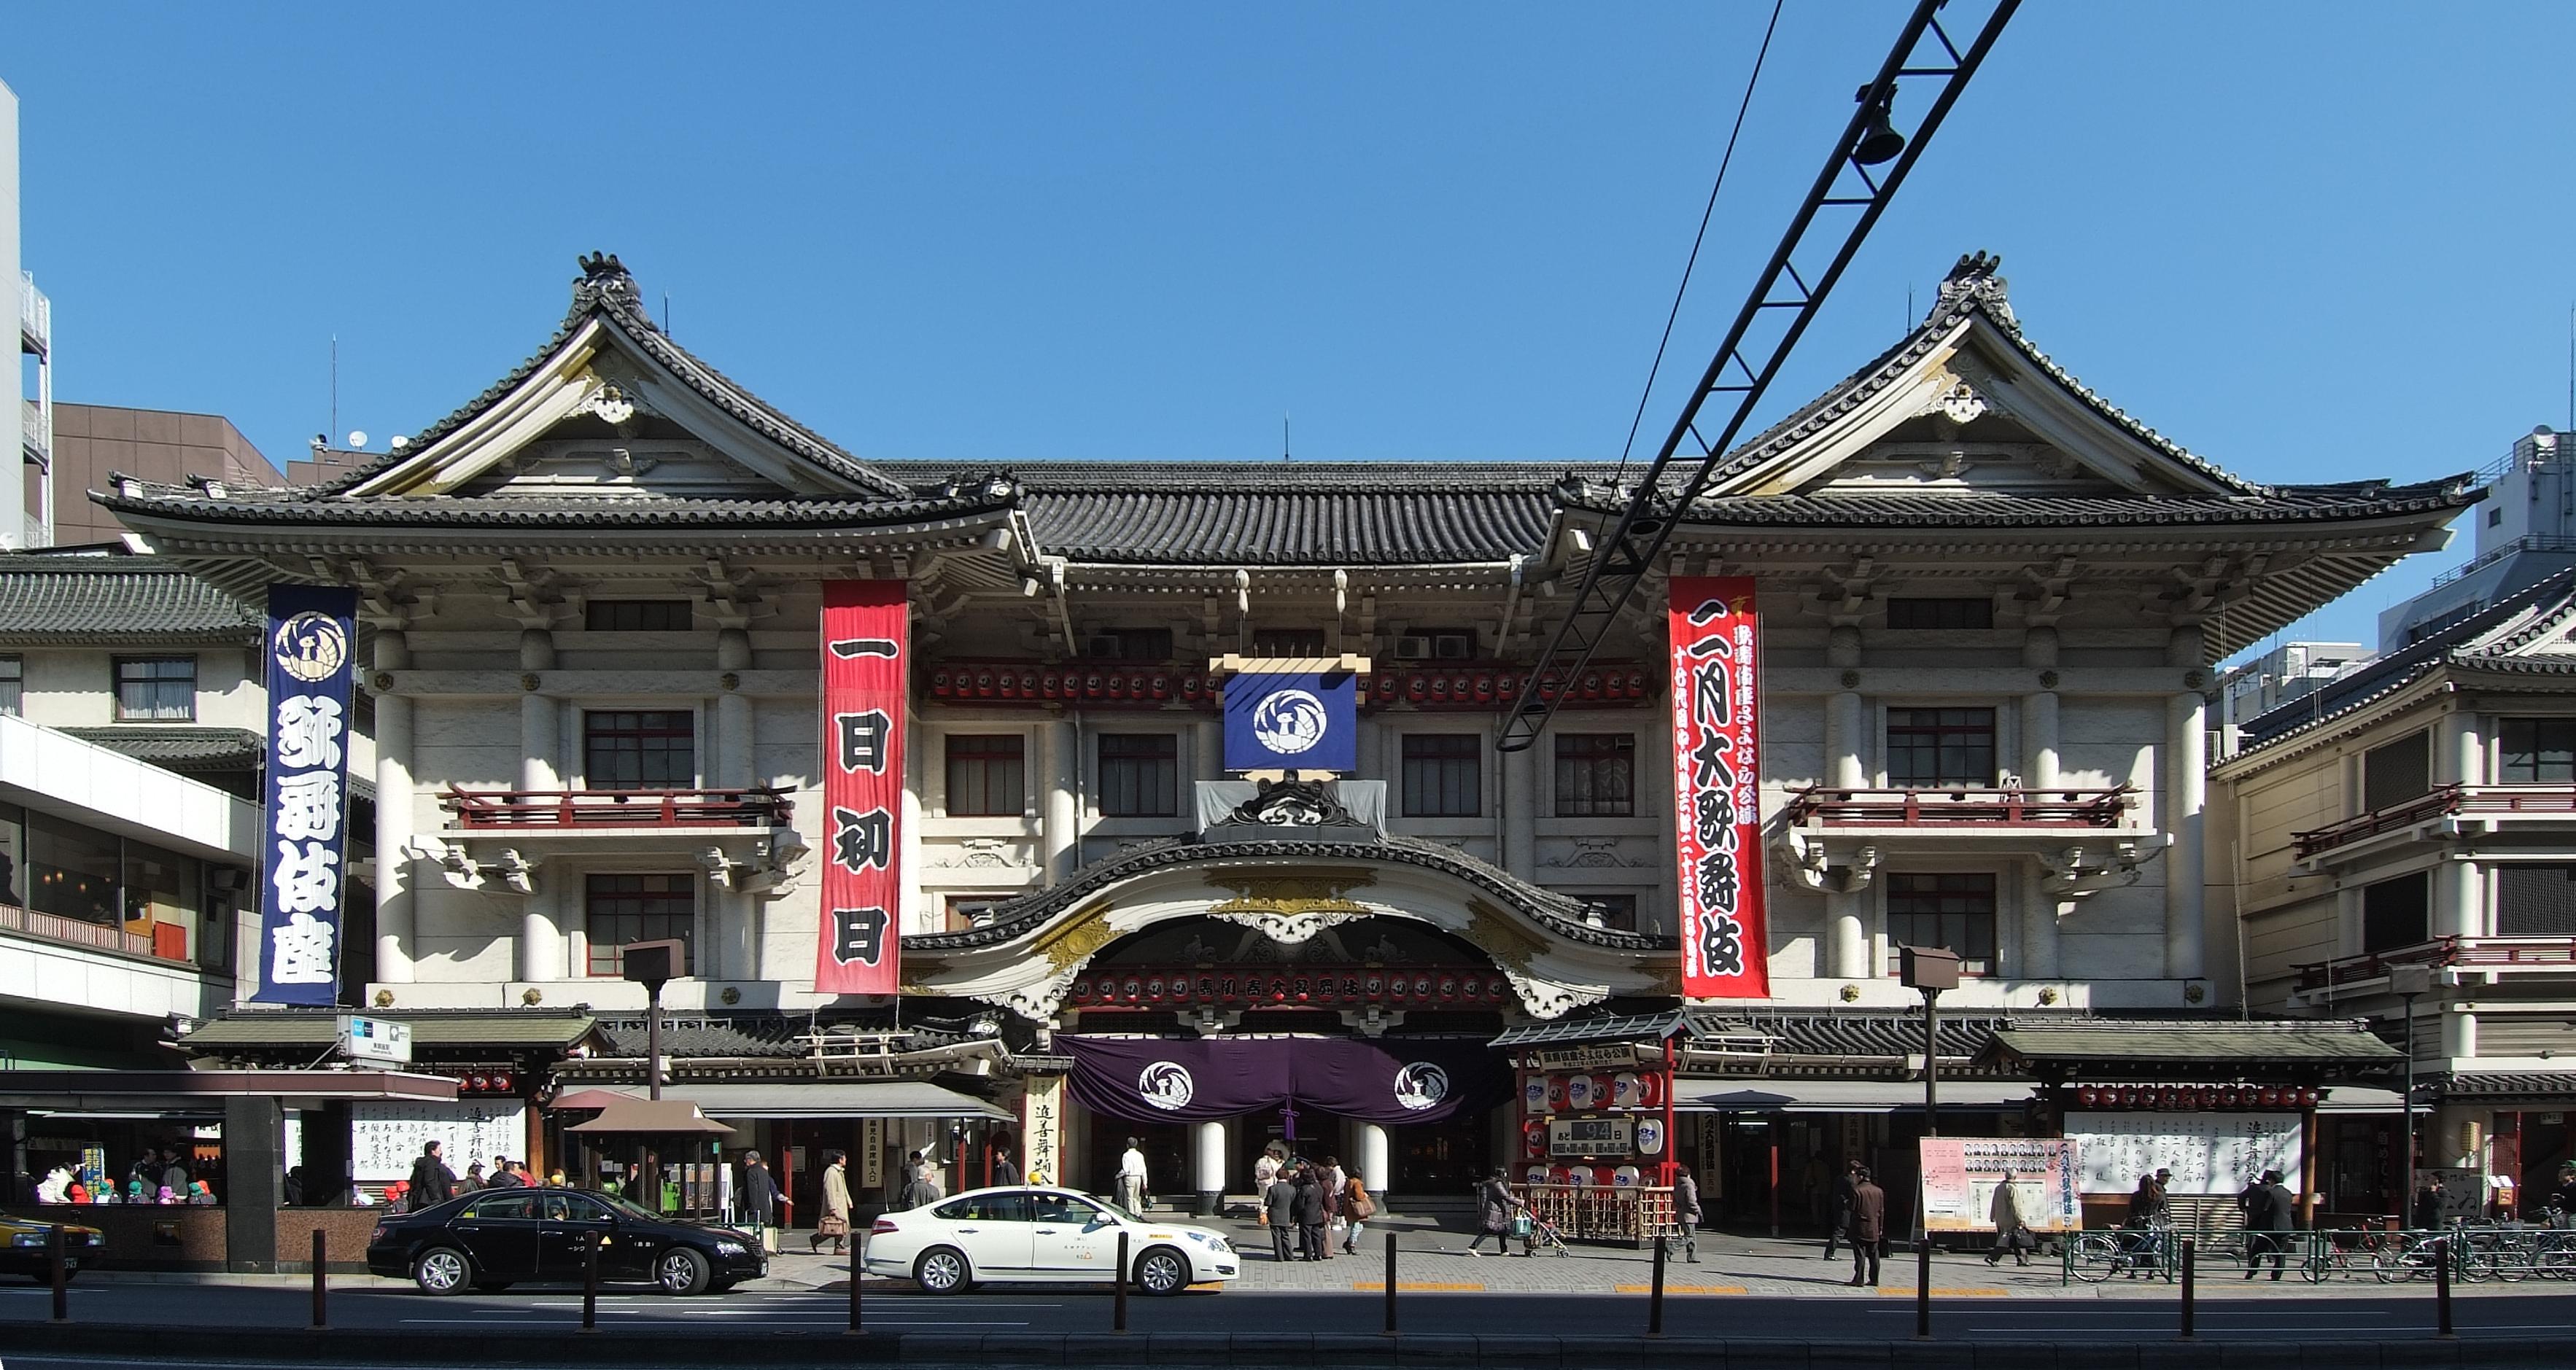 File:Kabuki-za theater 2010.jpg